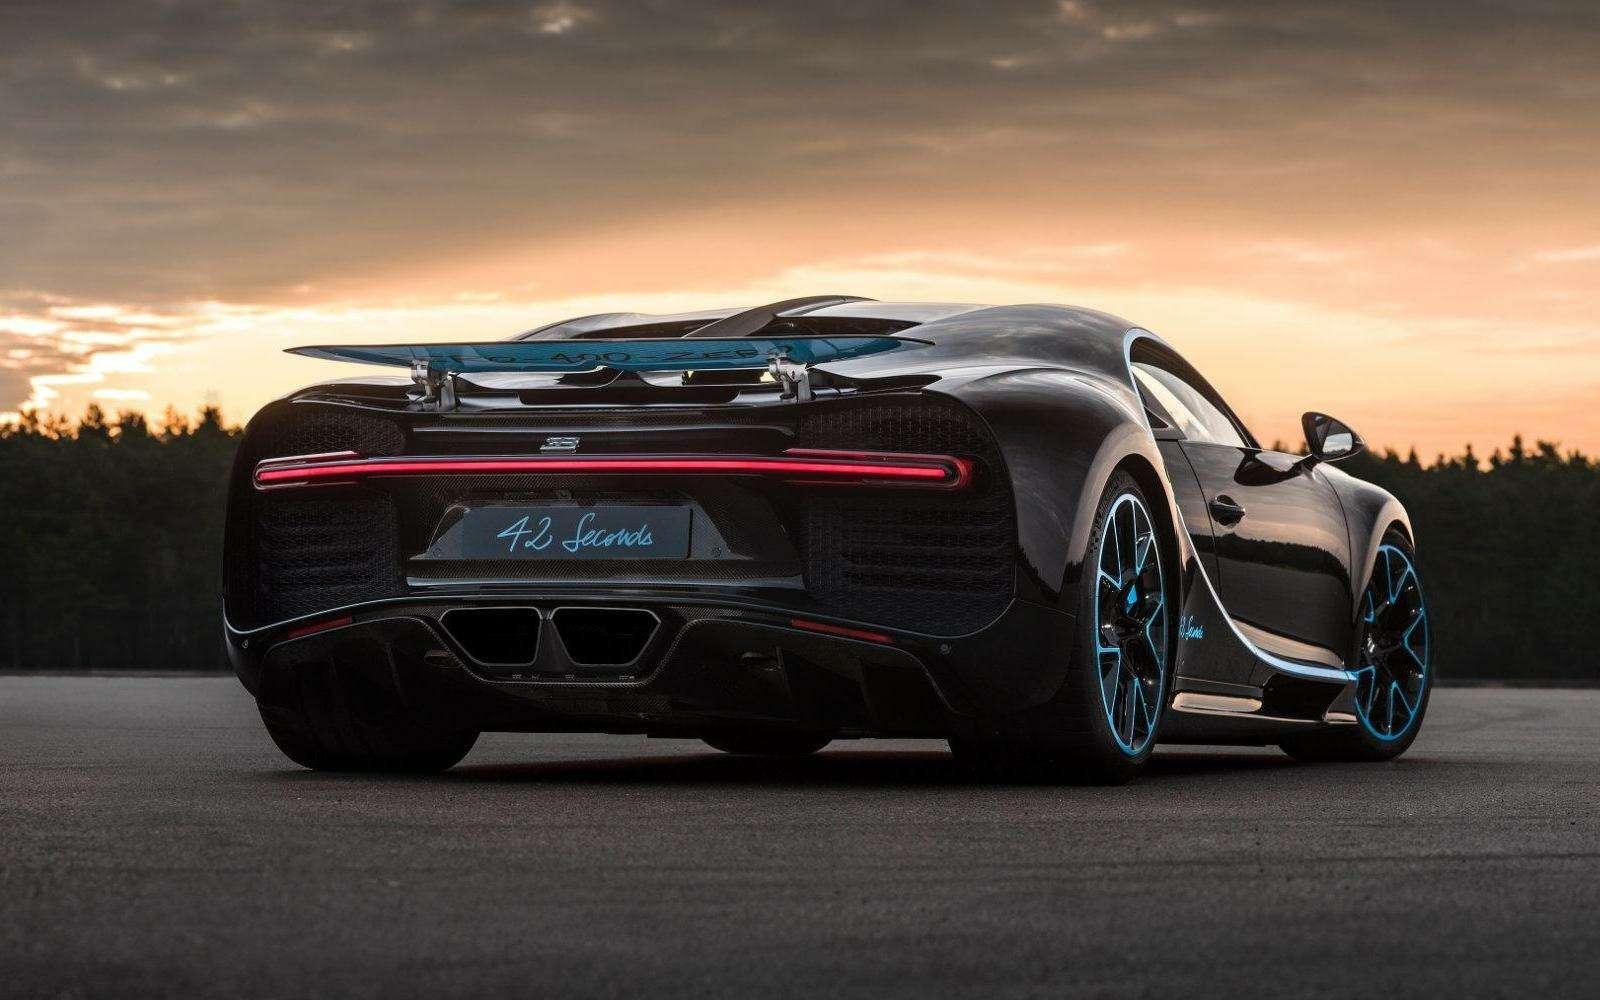 0-400-0 км/ч— видео рекордного заезда Bugatti Chiron— фото 794896